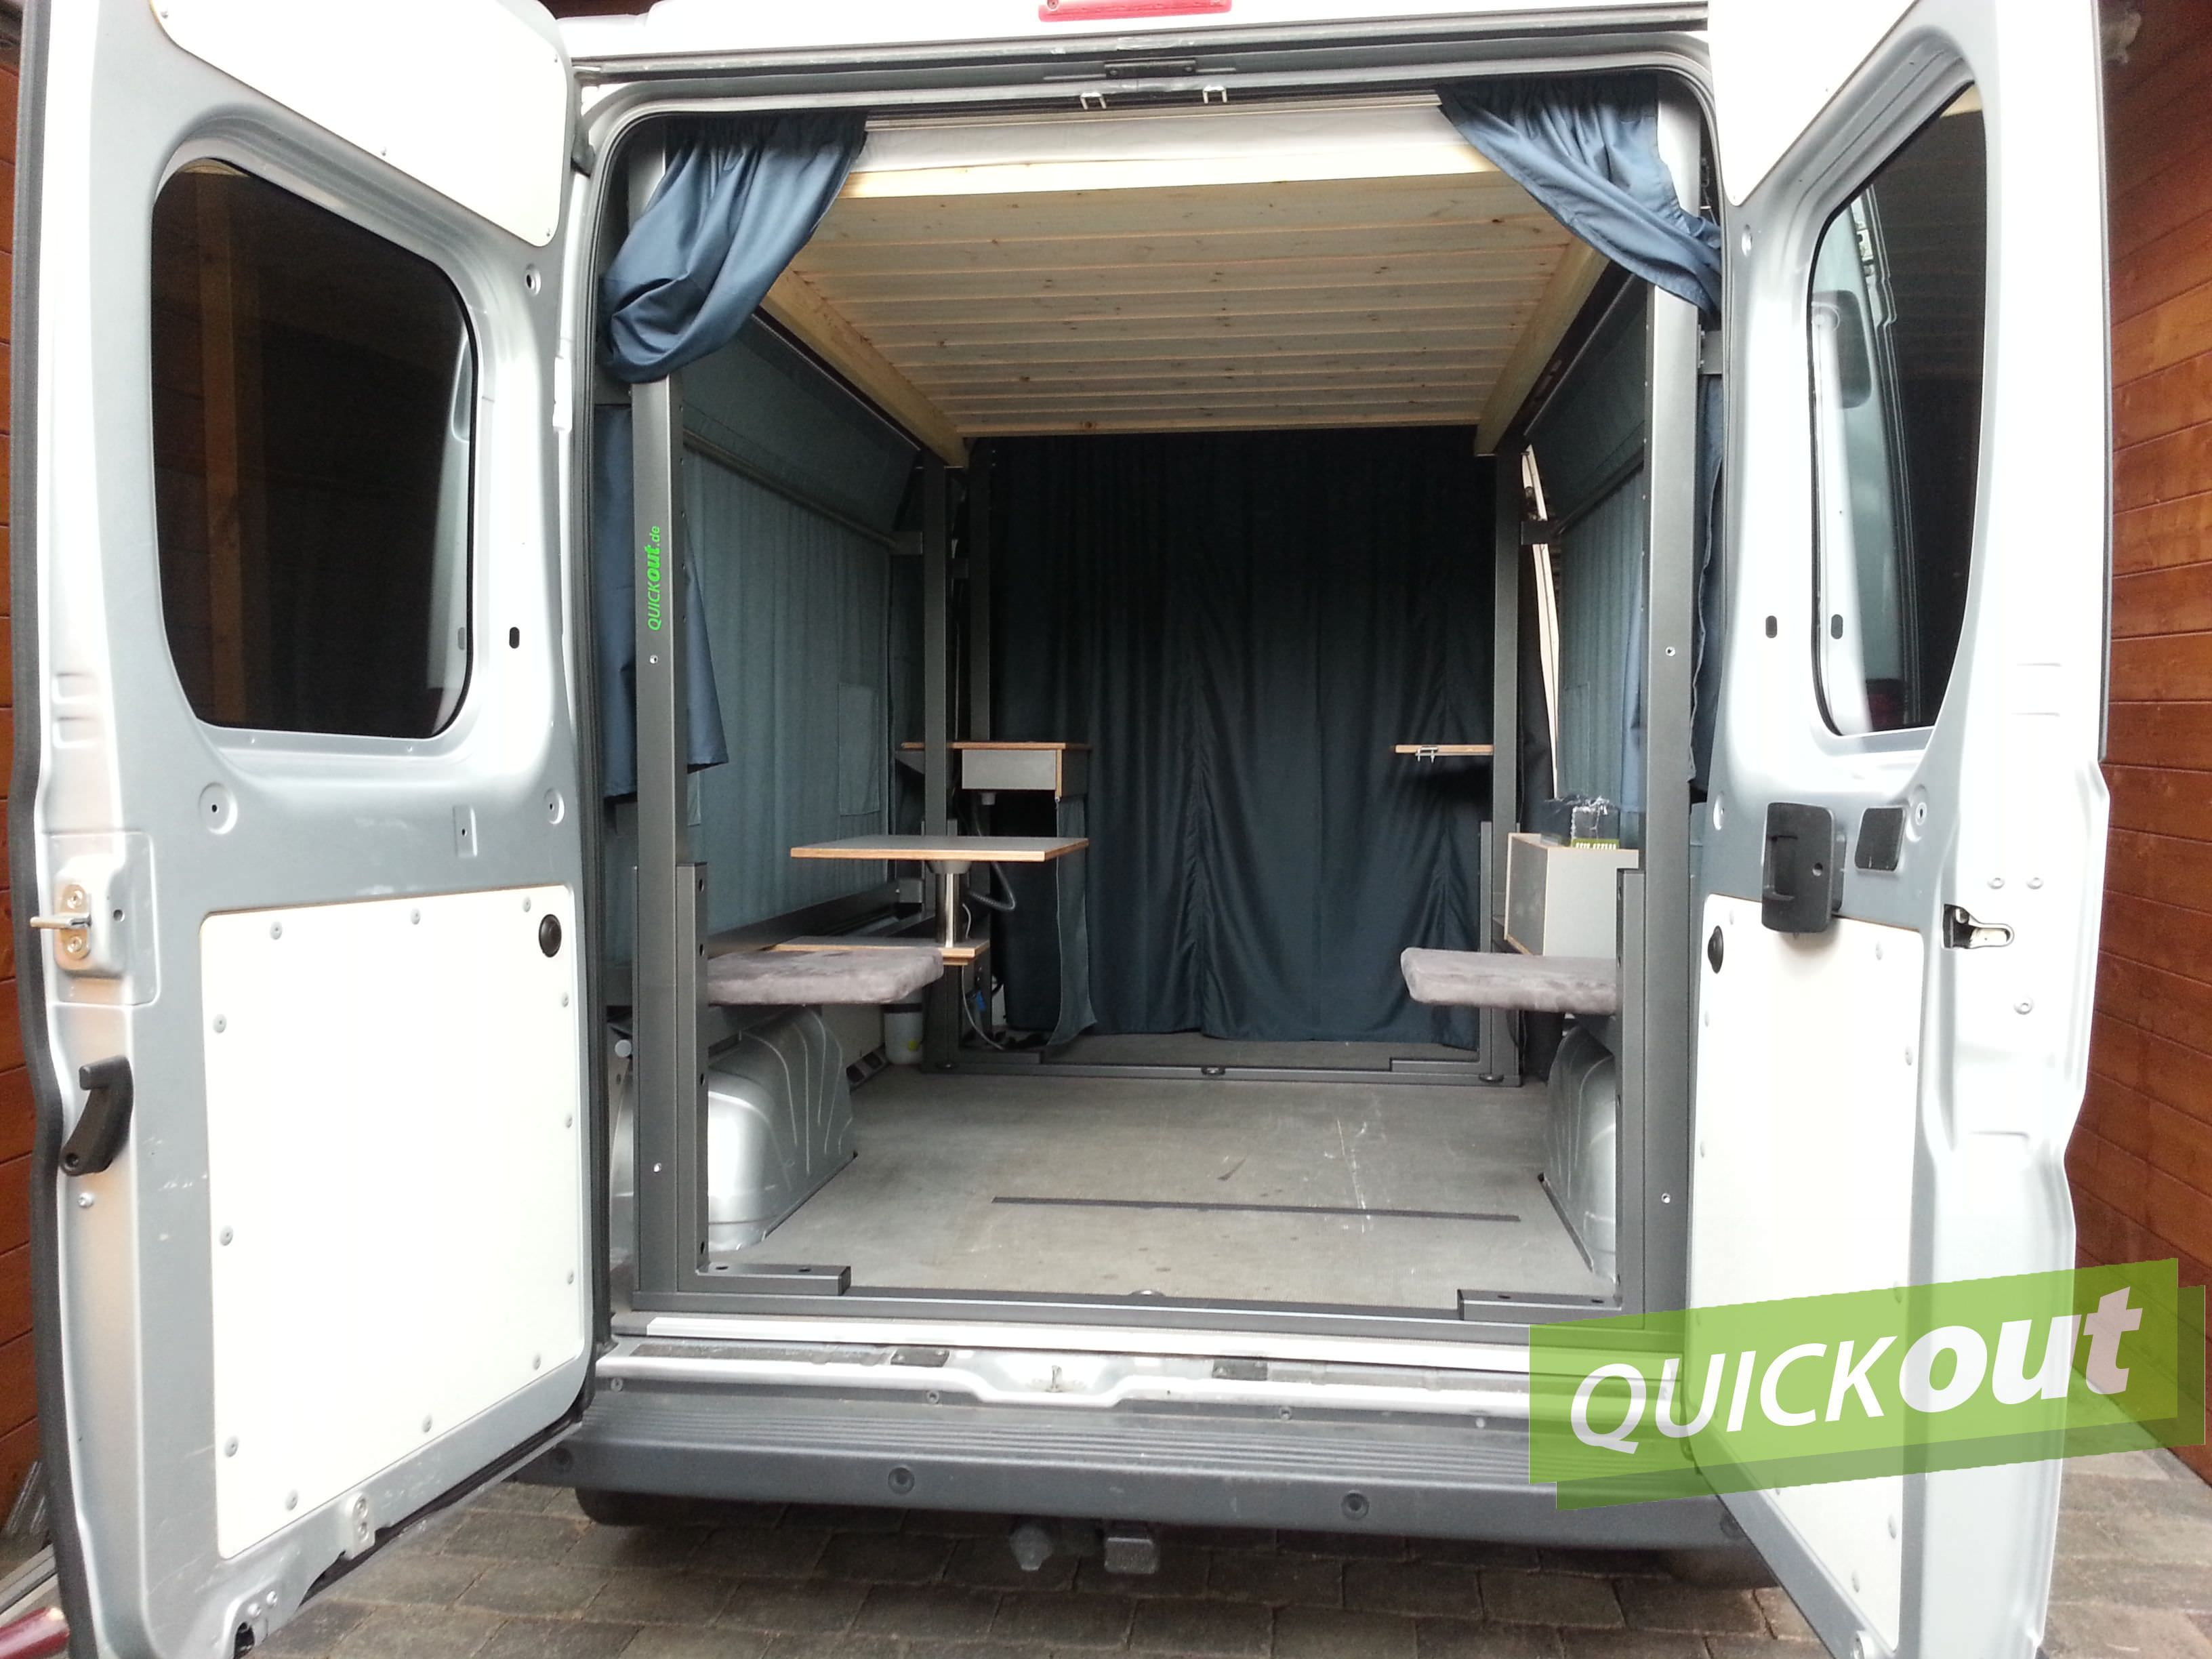 fiat ducato quickout wohnmobilausbau. Black Bedroom Furniture Sets. Home Design Ideas